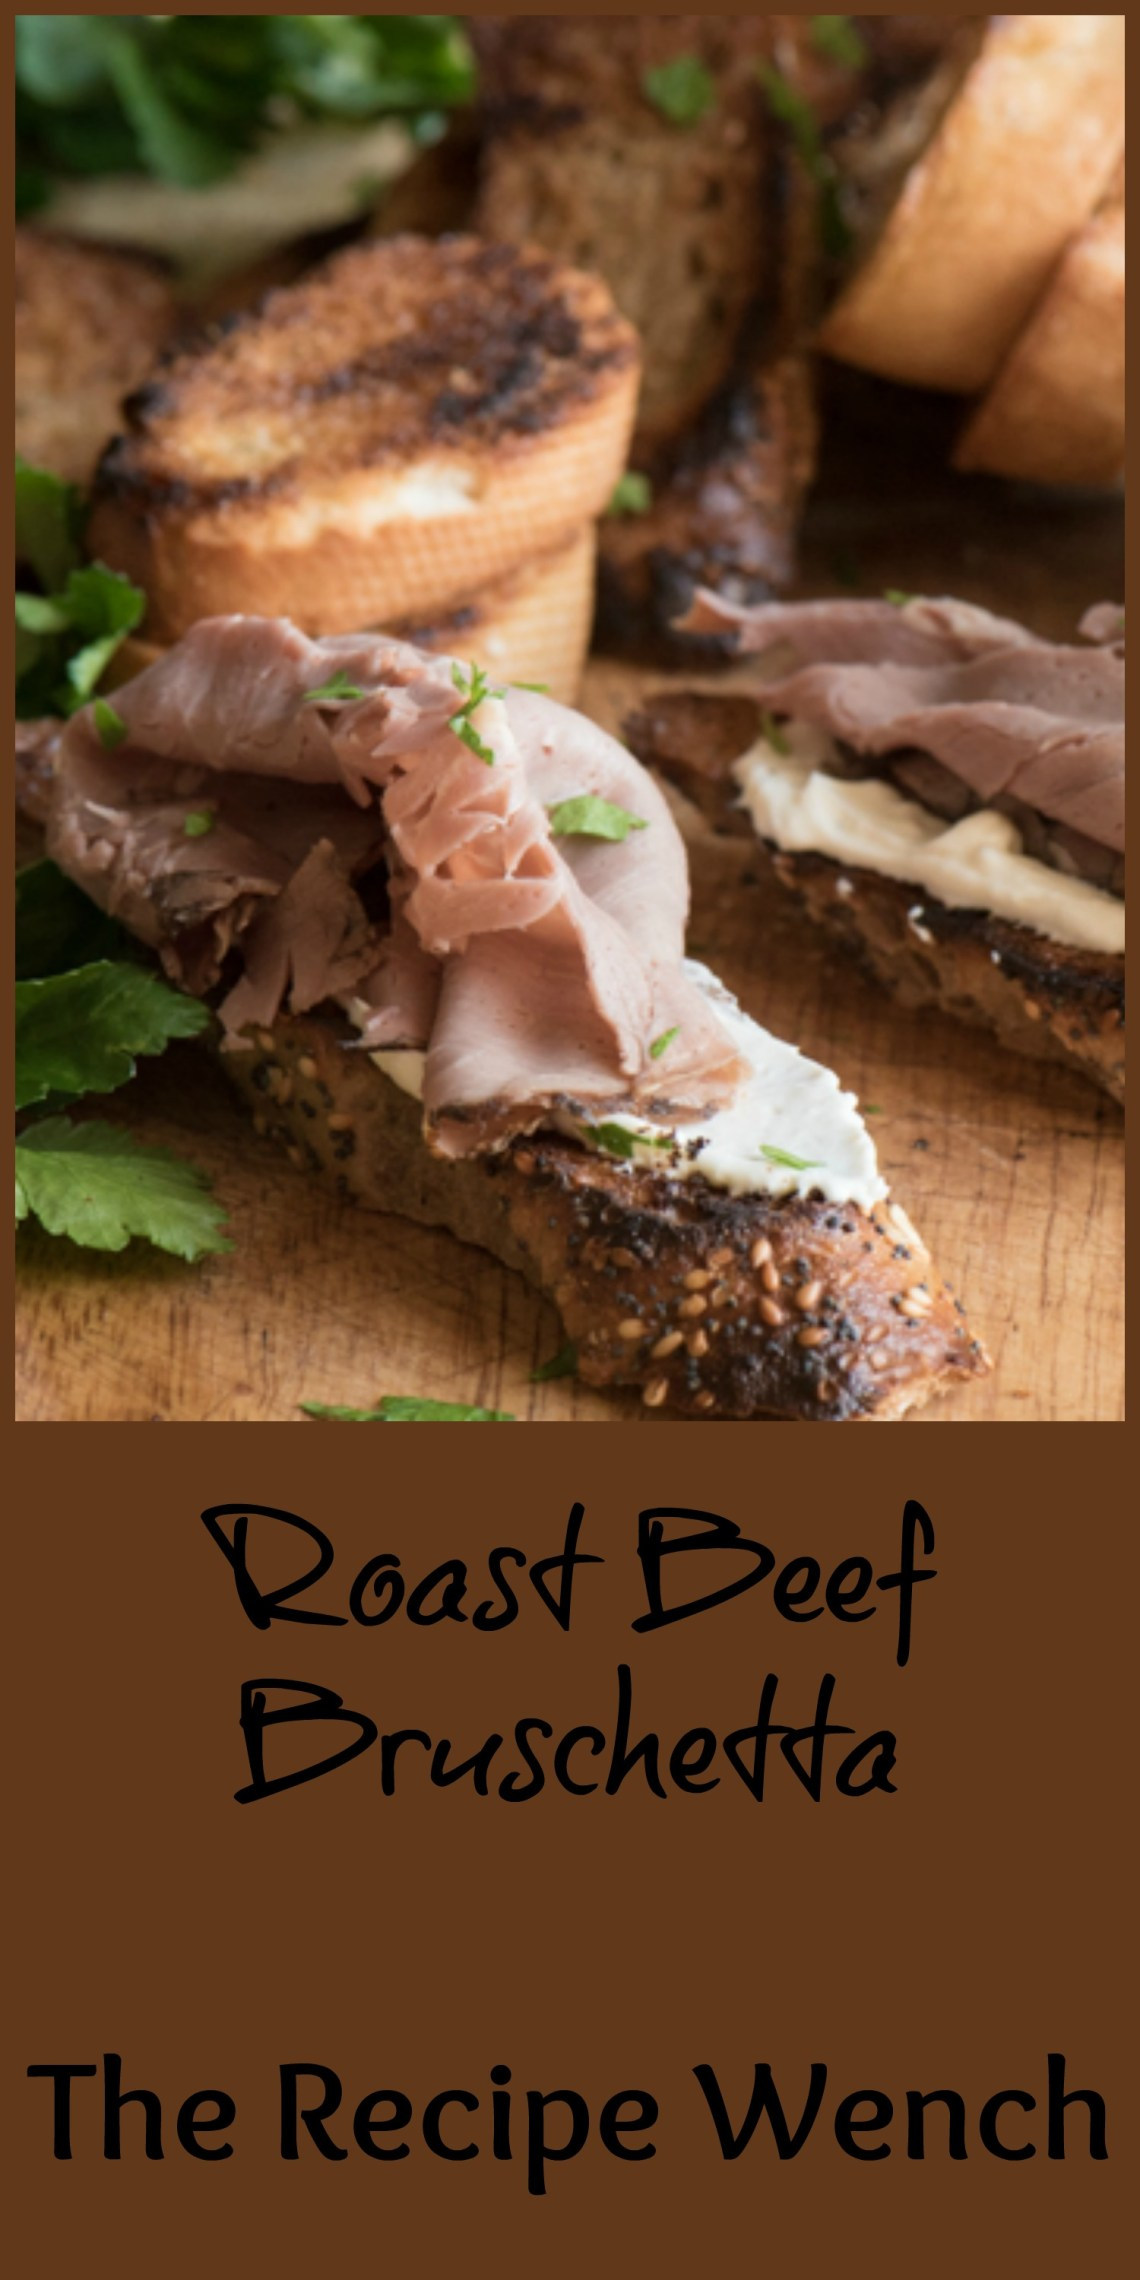 Roast Beef Bruschetta - rub a little garlic on toast, maybe add some horseradish, cream cheese and BOOM! | The Recipe Wench